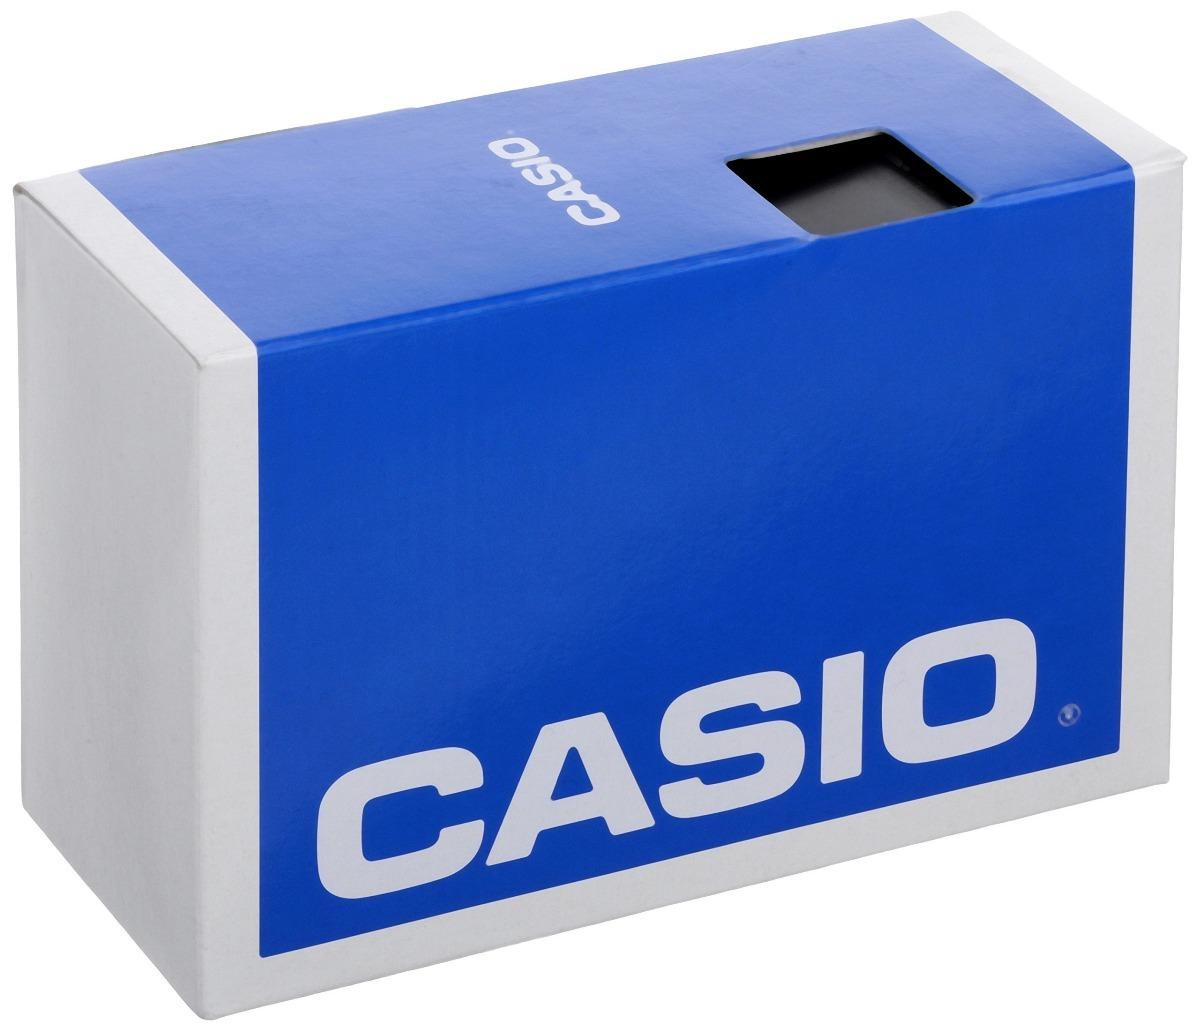 21cf1e409e1 relógio casio vintage world time a500wa-7df - novo - a500wa. Carregando  zoom.